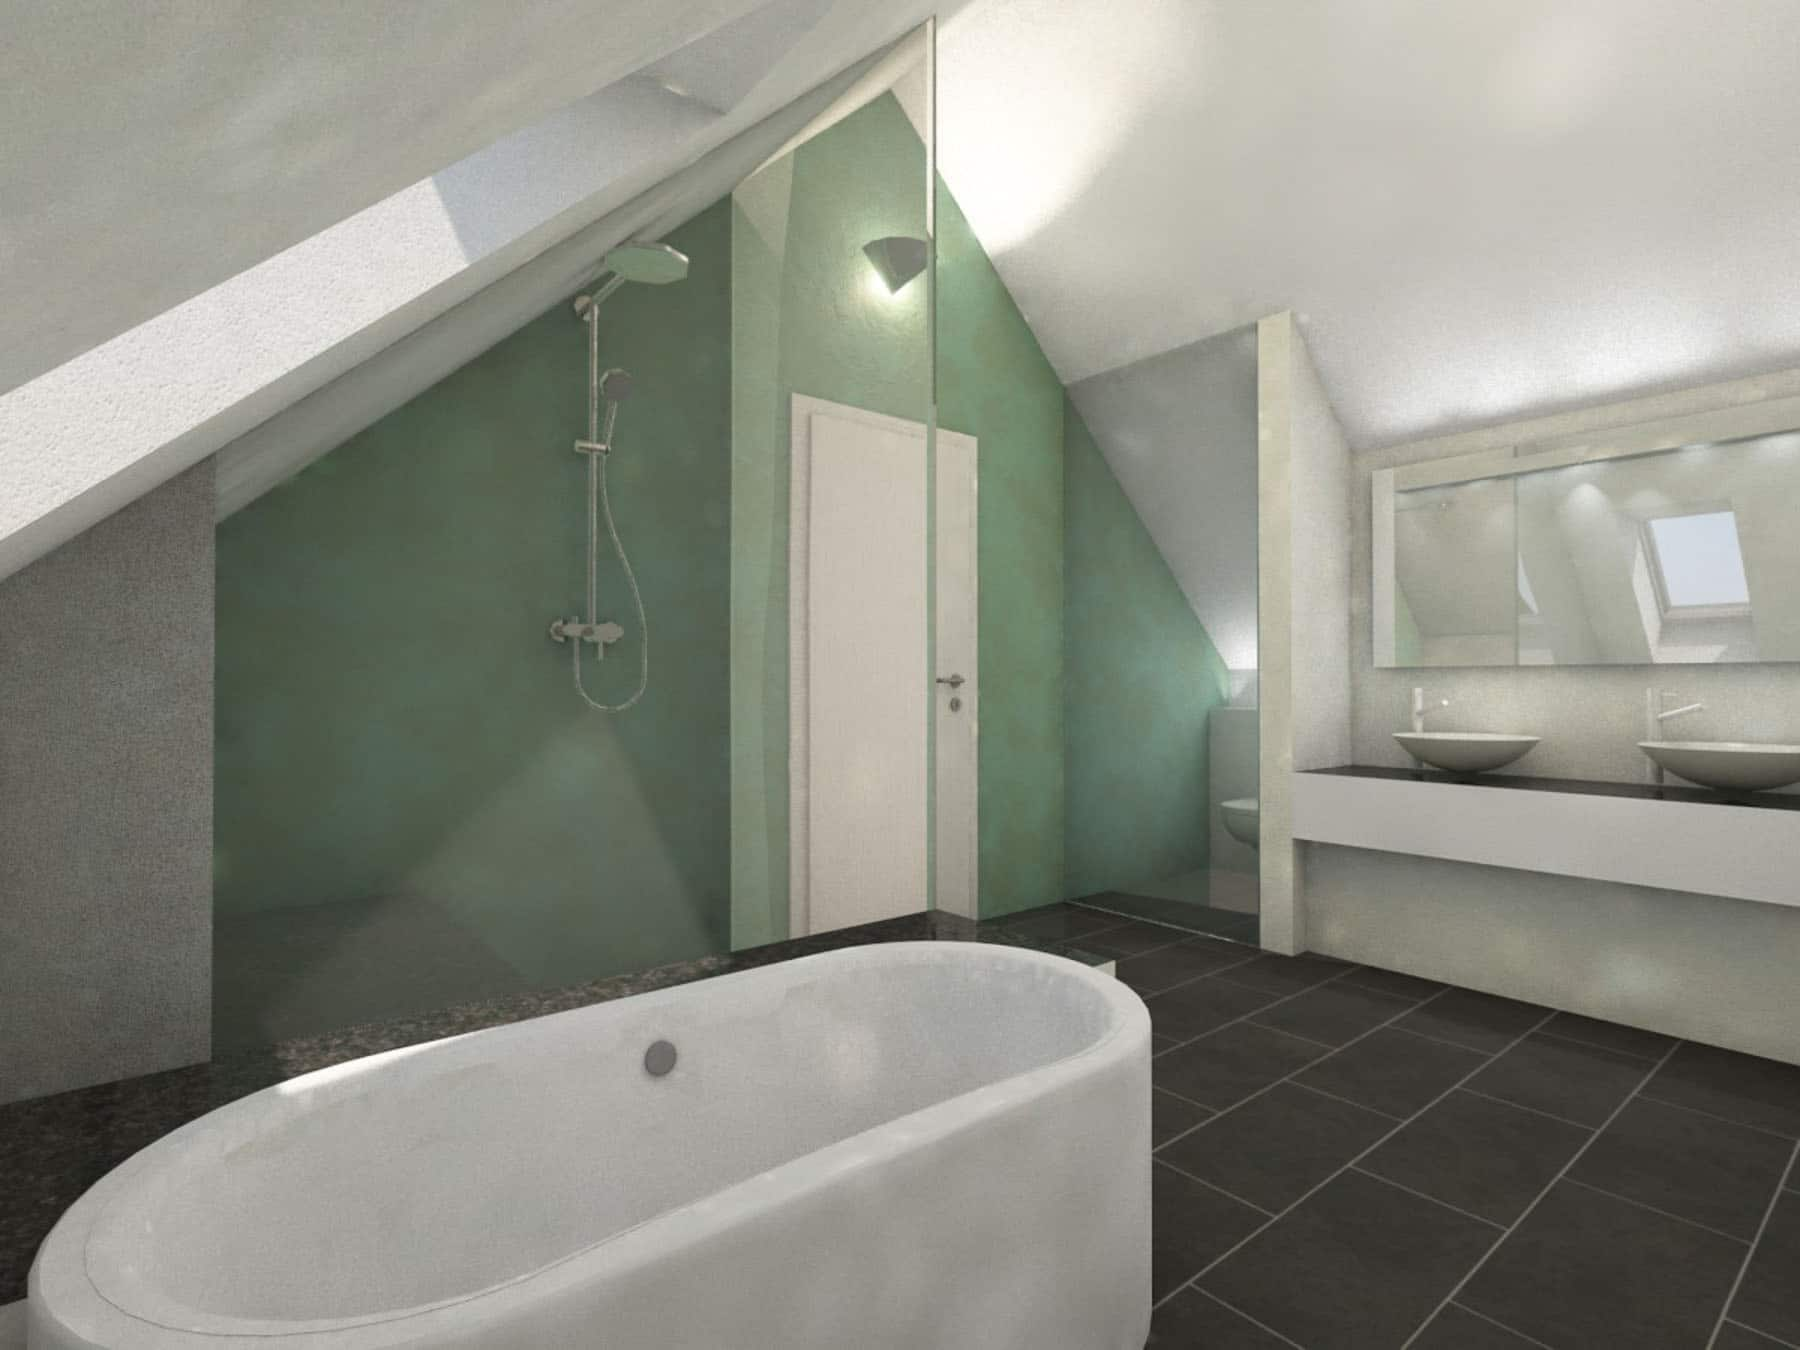 13-Bad Dusche WC neu-bearbeitet